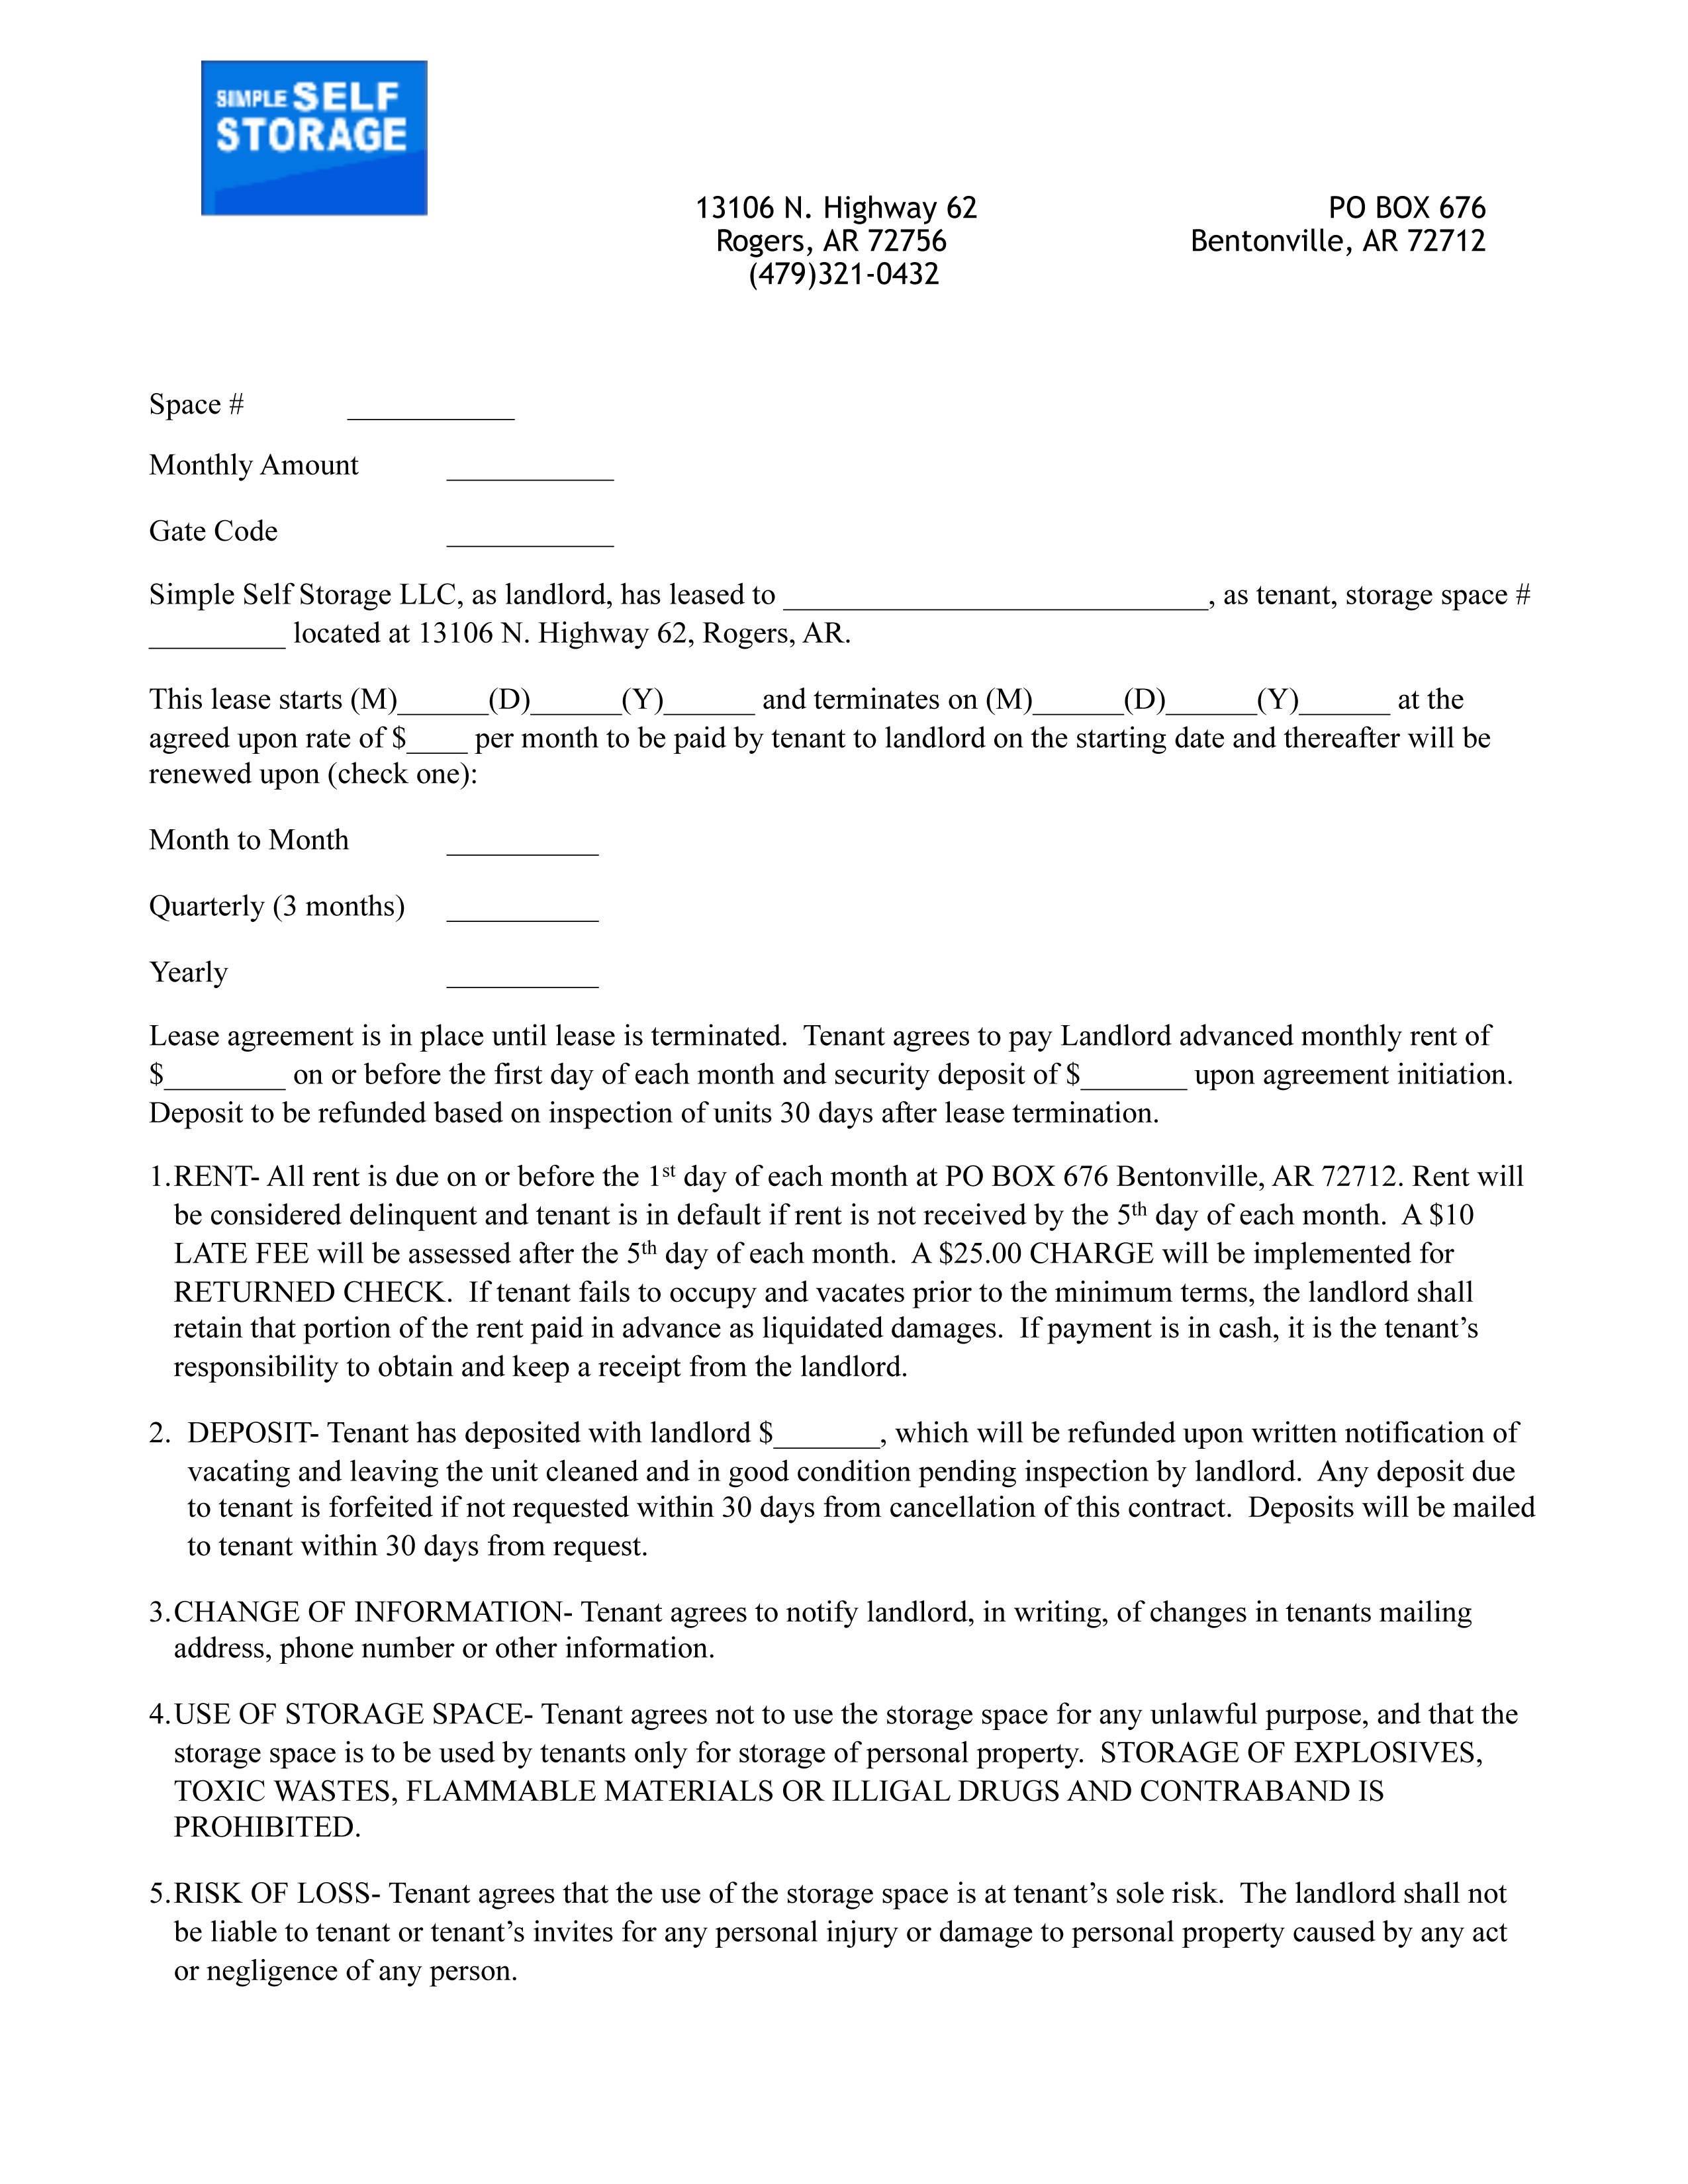 Self Storage Rental Agreement Template